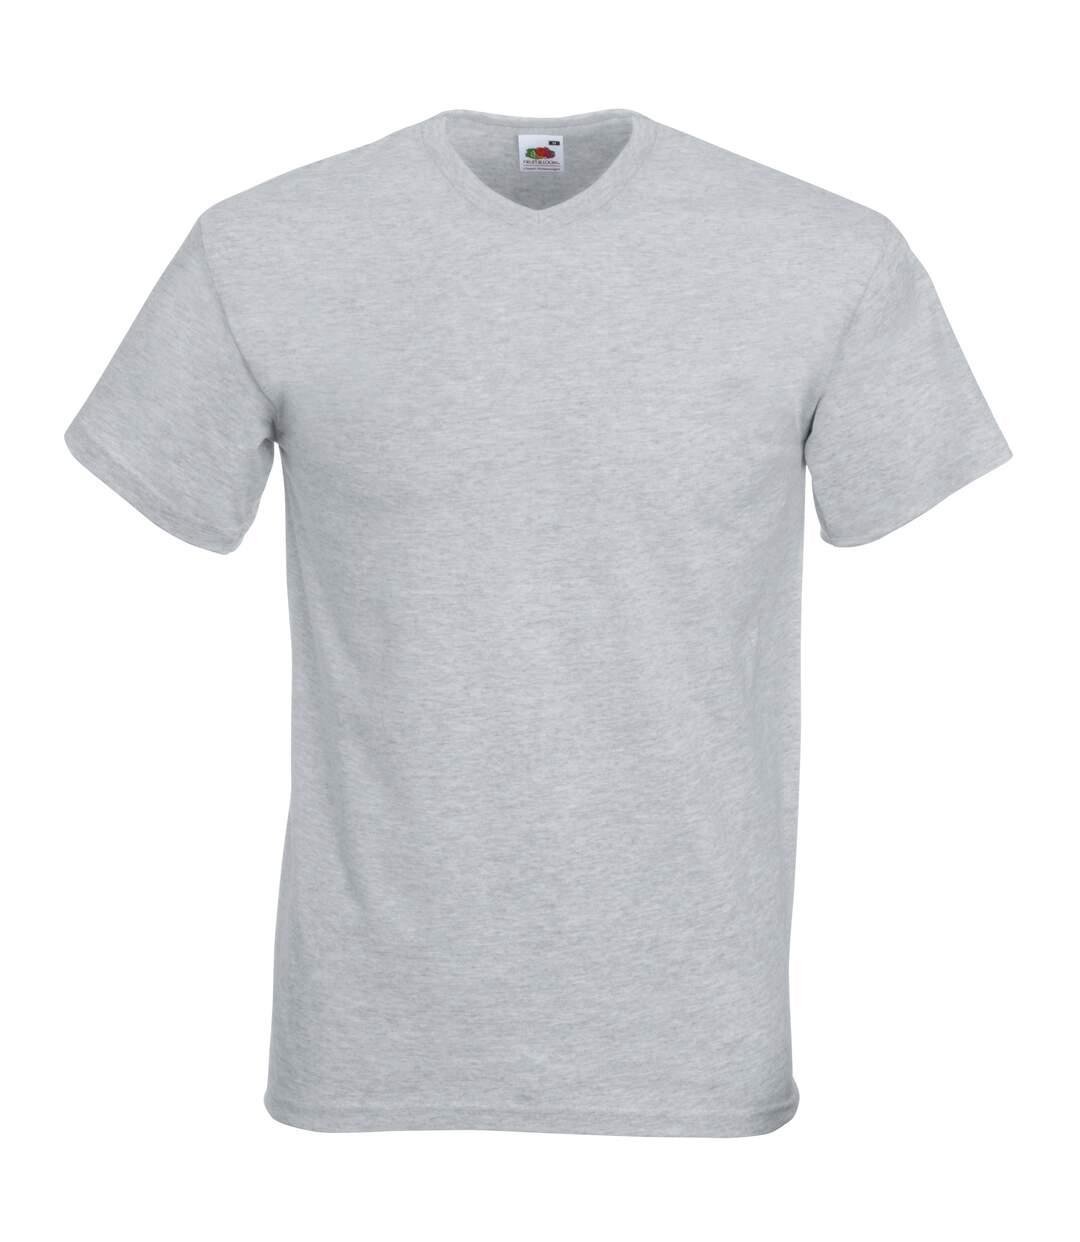 Fruit Of The Loom Mens Valueweight V-Neck, Short Sleeve T-Shirt (Deep Navy) - UTBC338